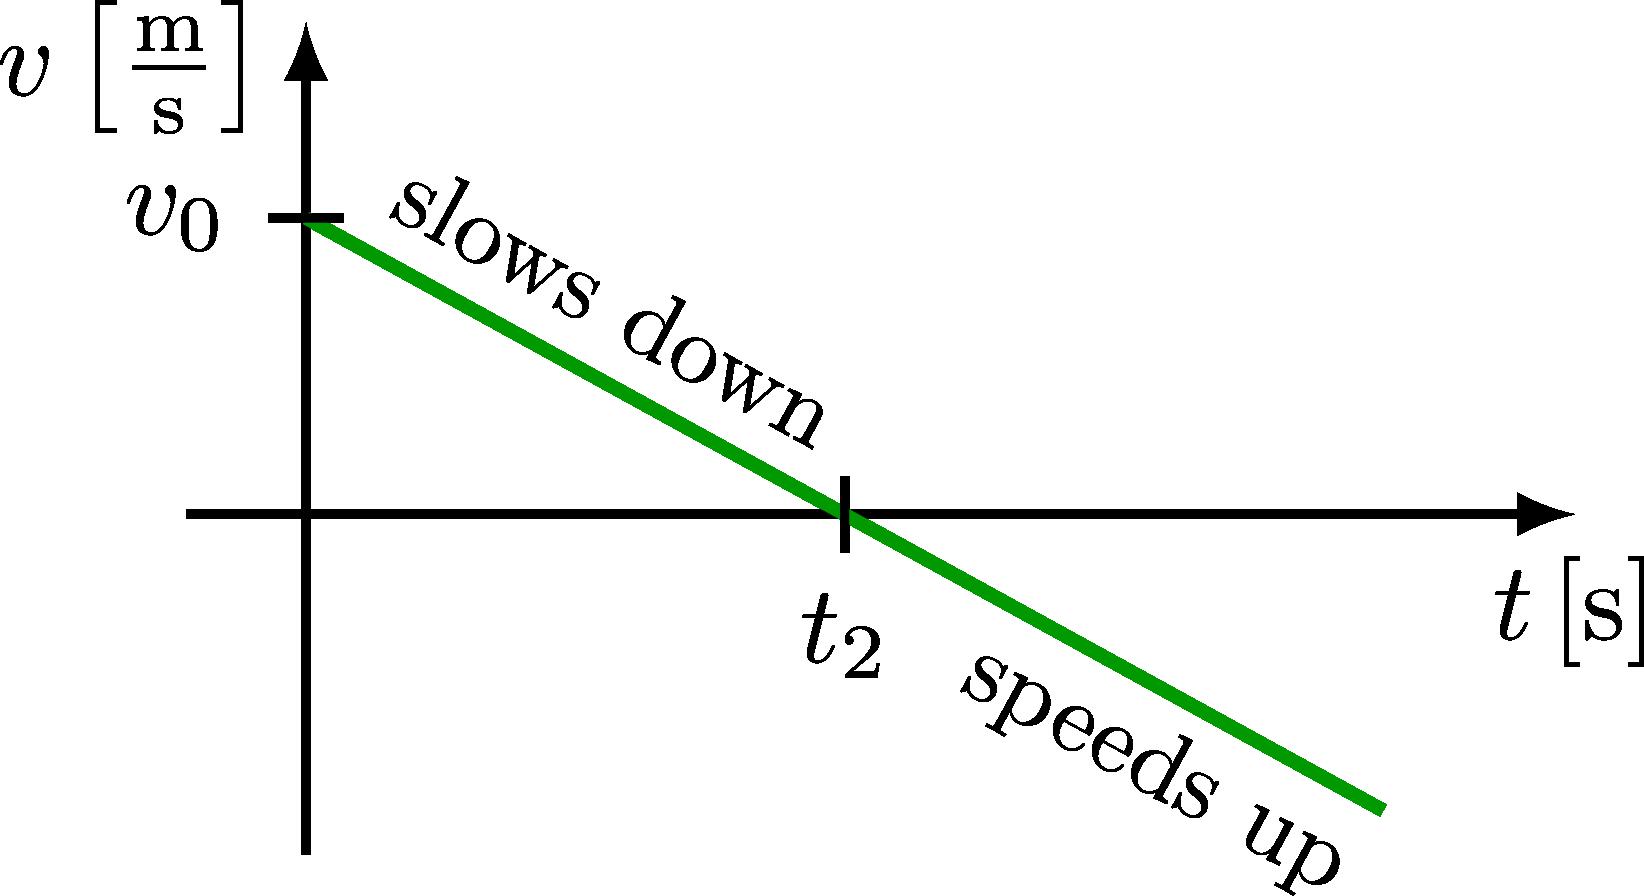 kinematics_curves-009.png